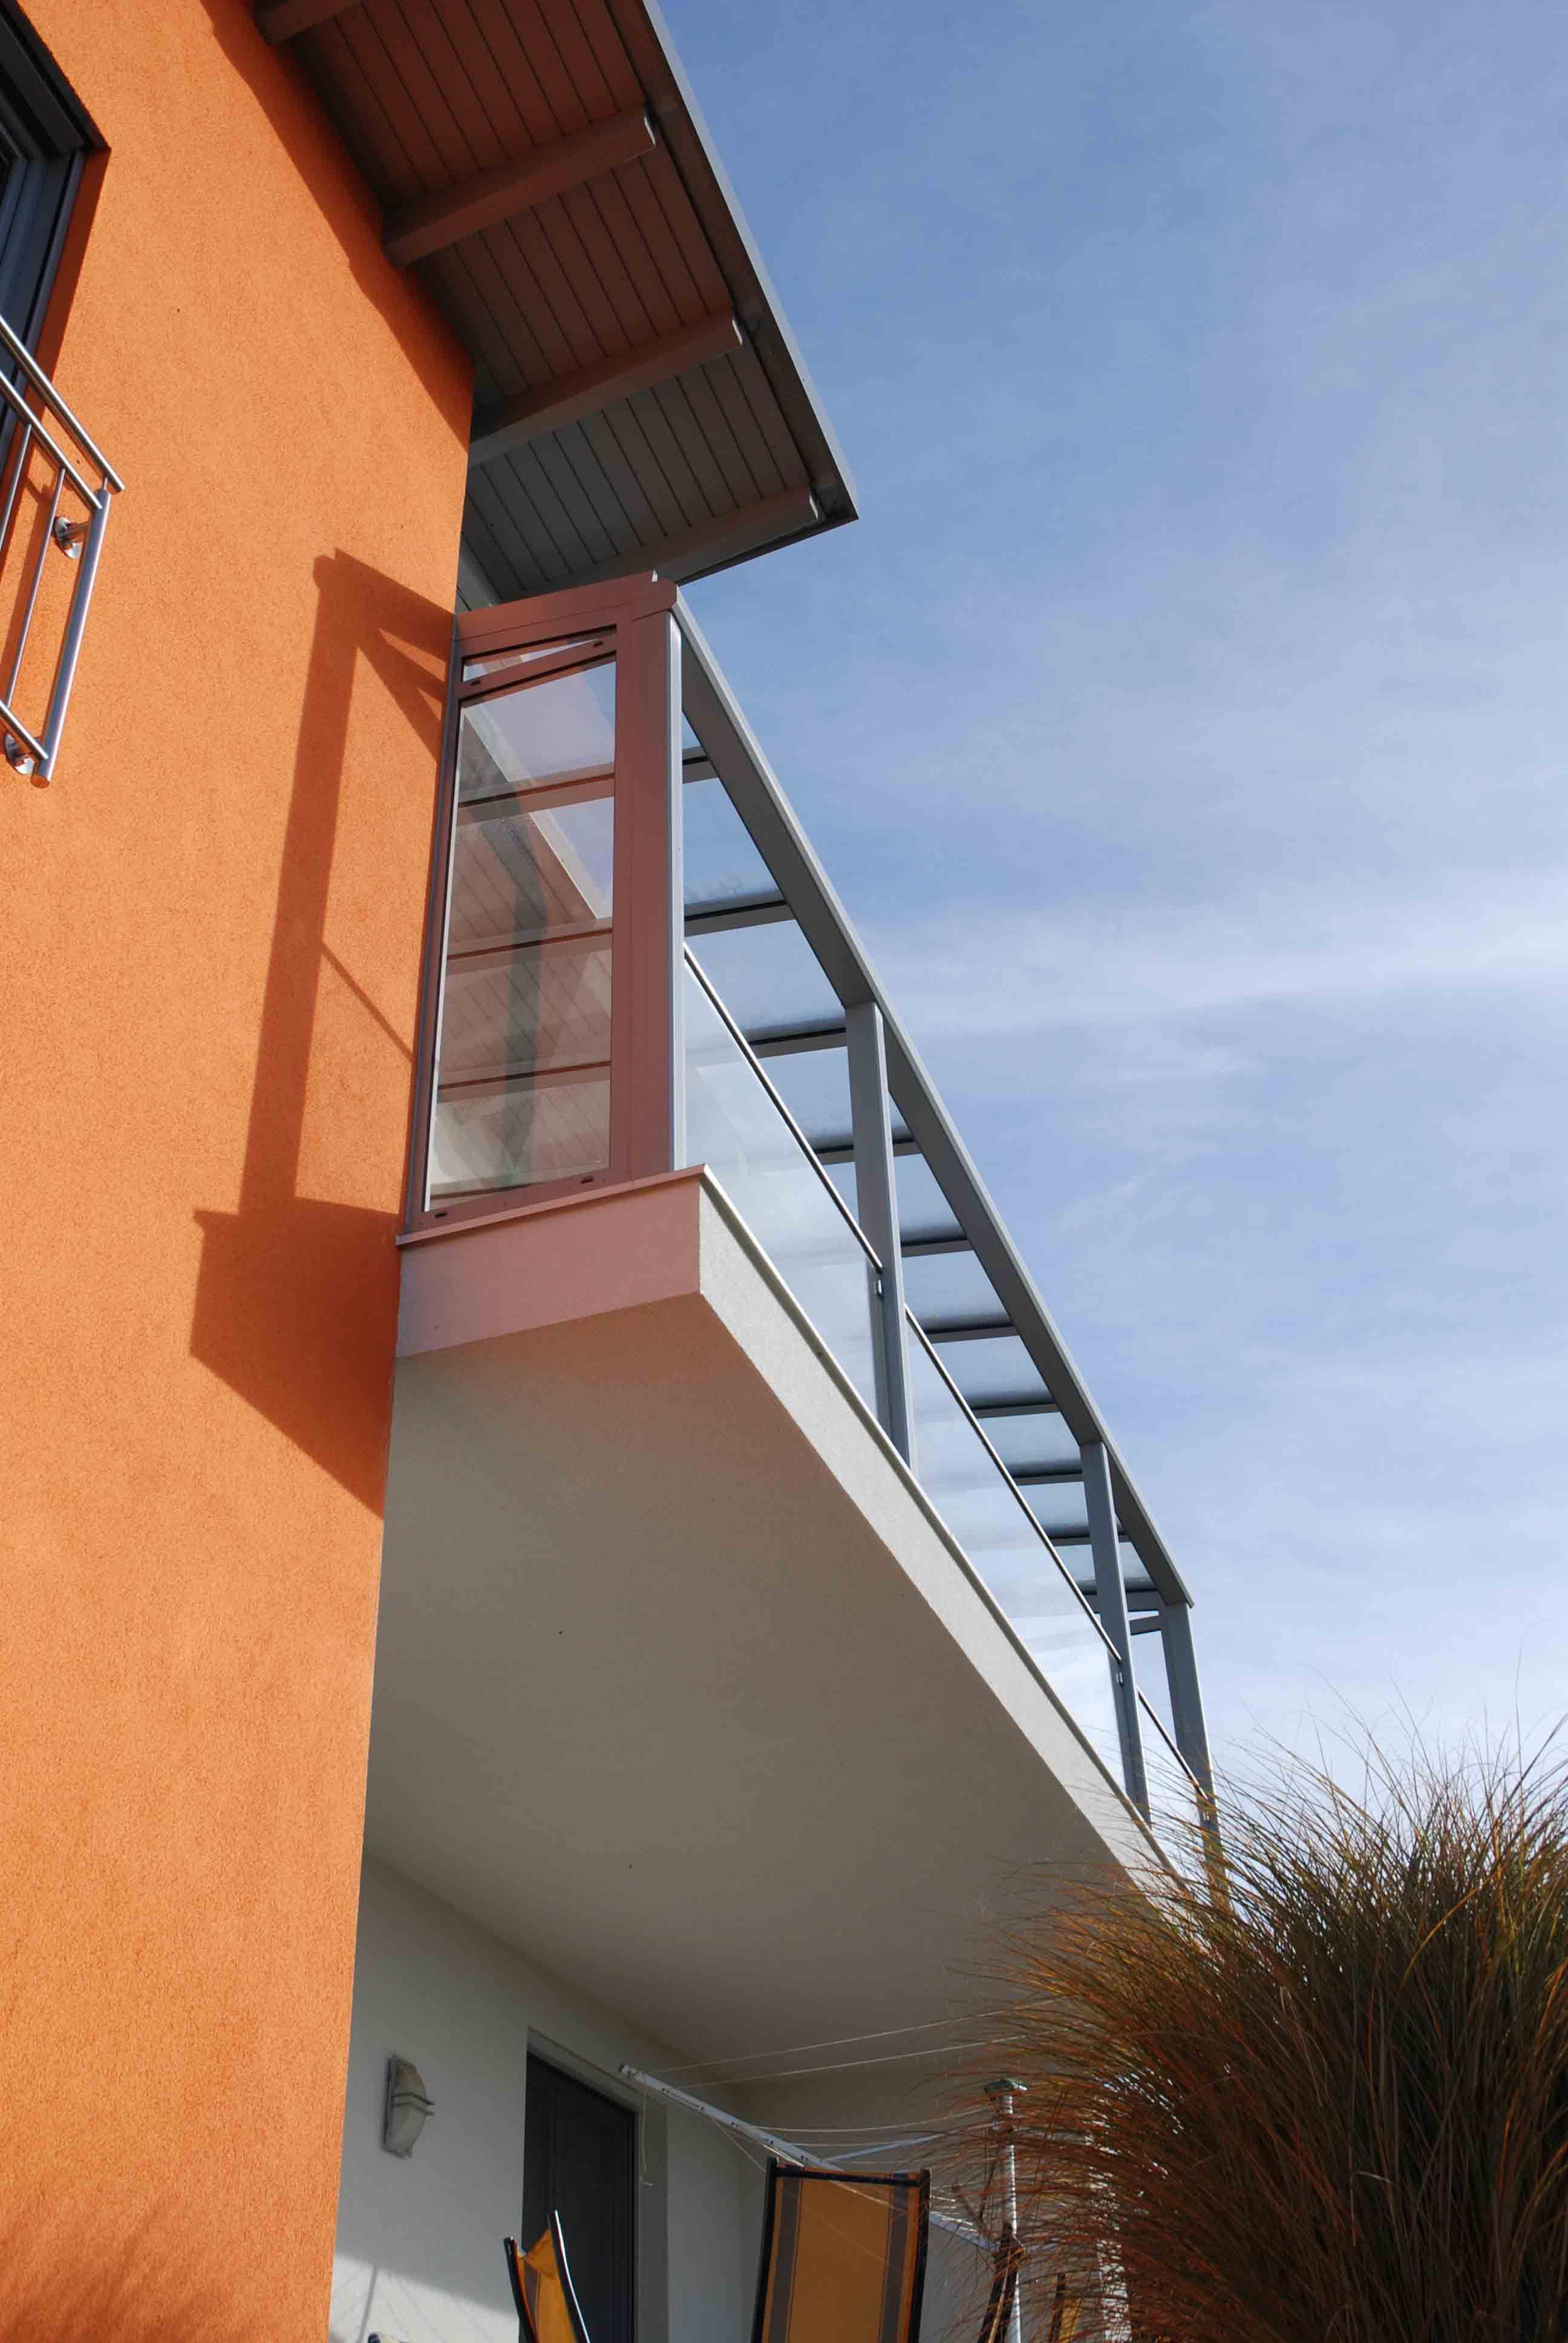 Balkonuberdachung Alu Glas Verglasungen Balkon Terrasse